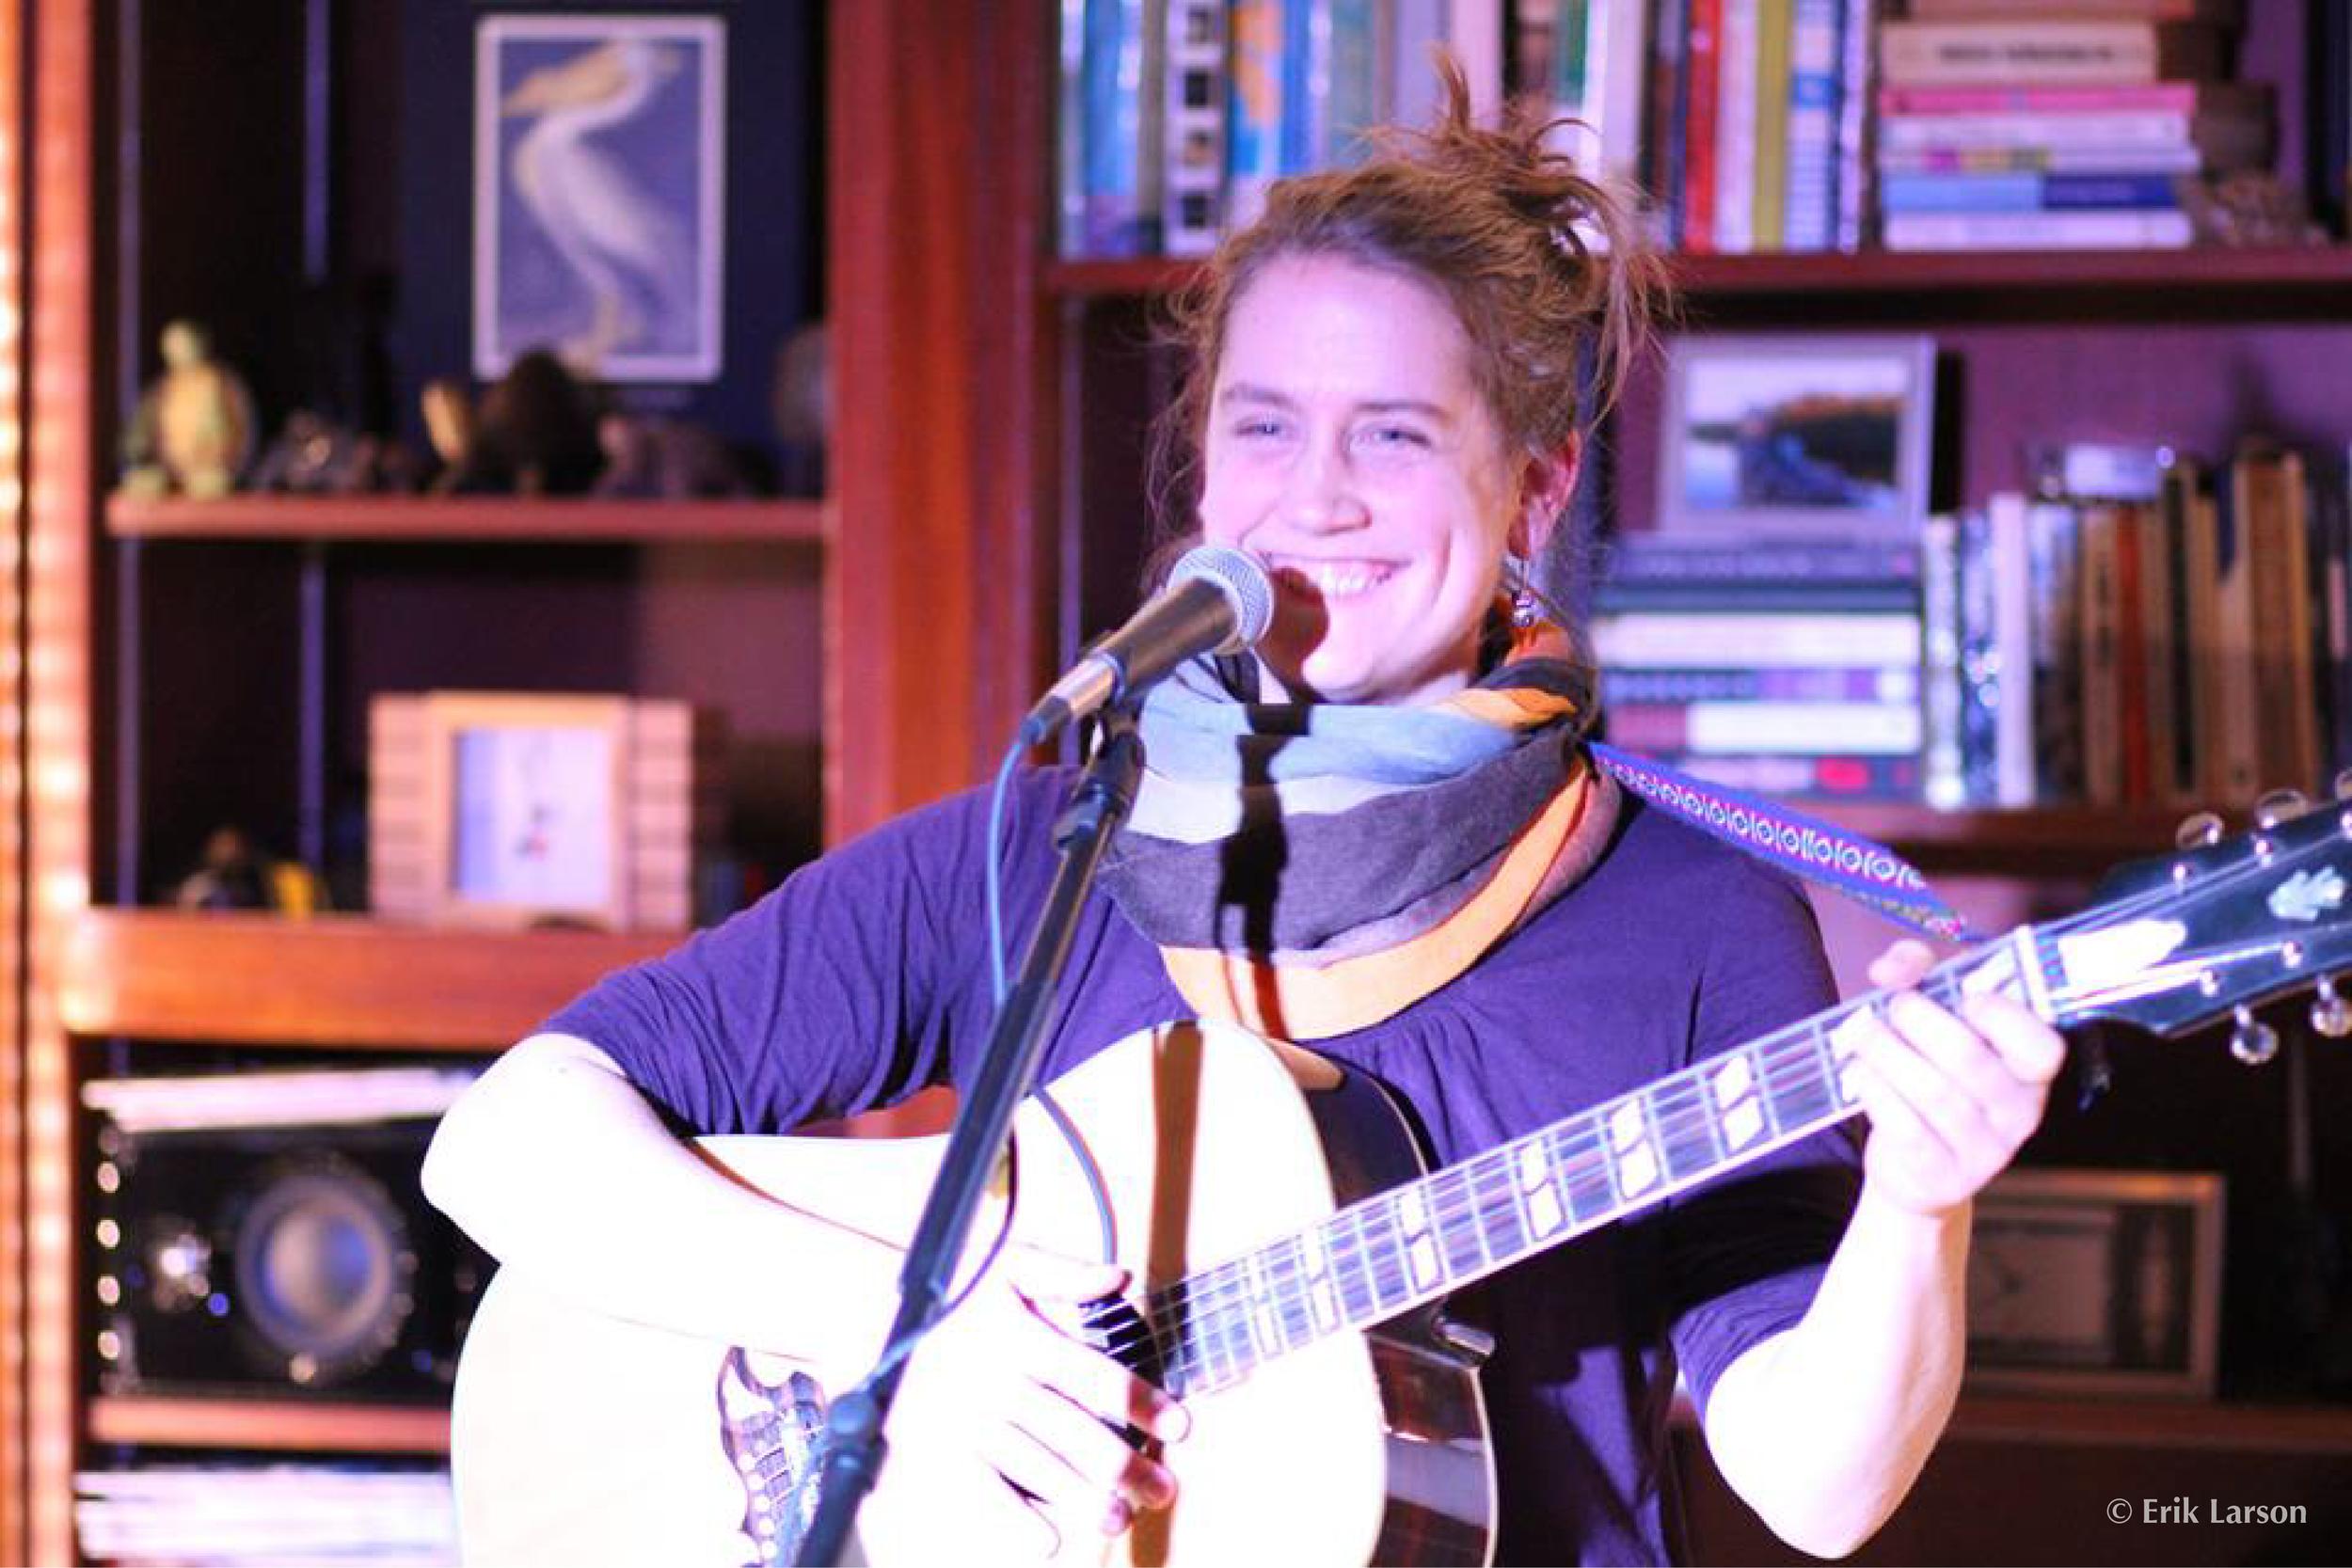 2016 Jennifer Levenhagen, Wintersong at Squalid Manor, photo by Erik Larson (d).png